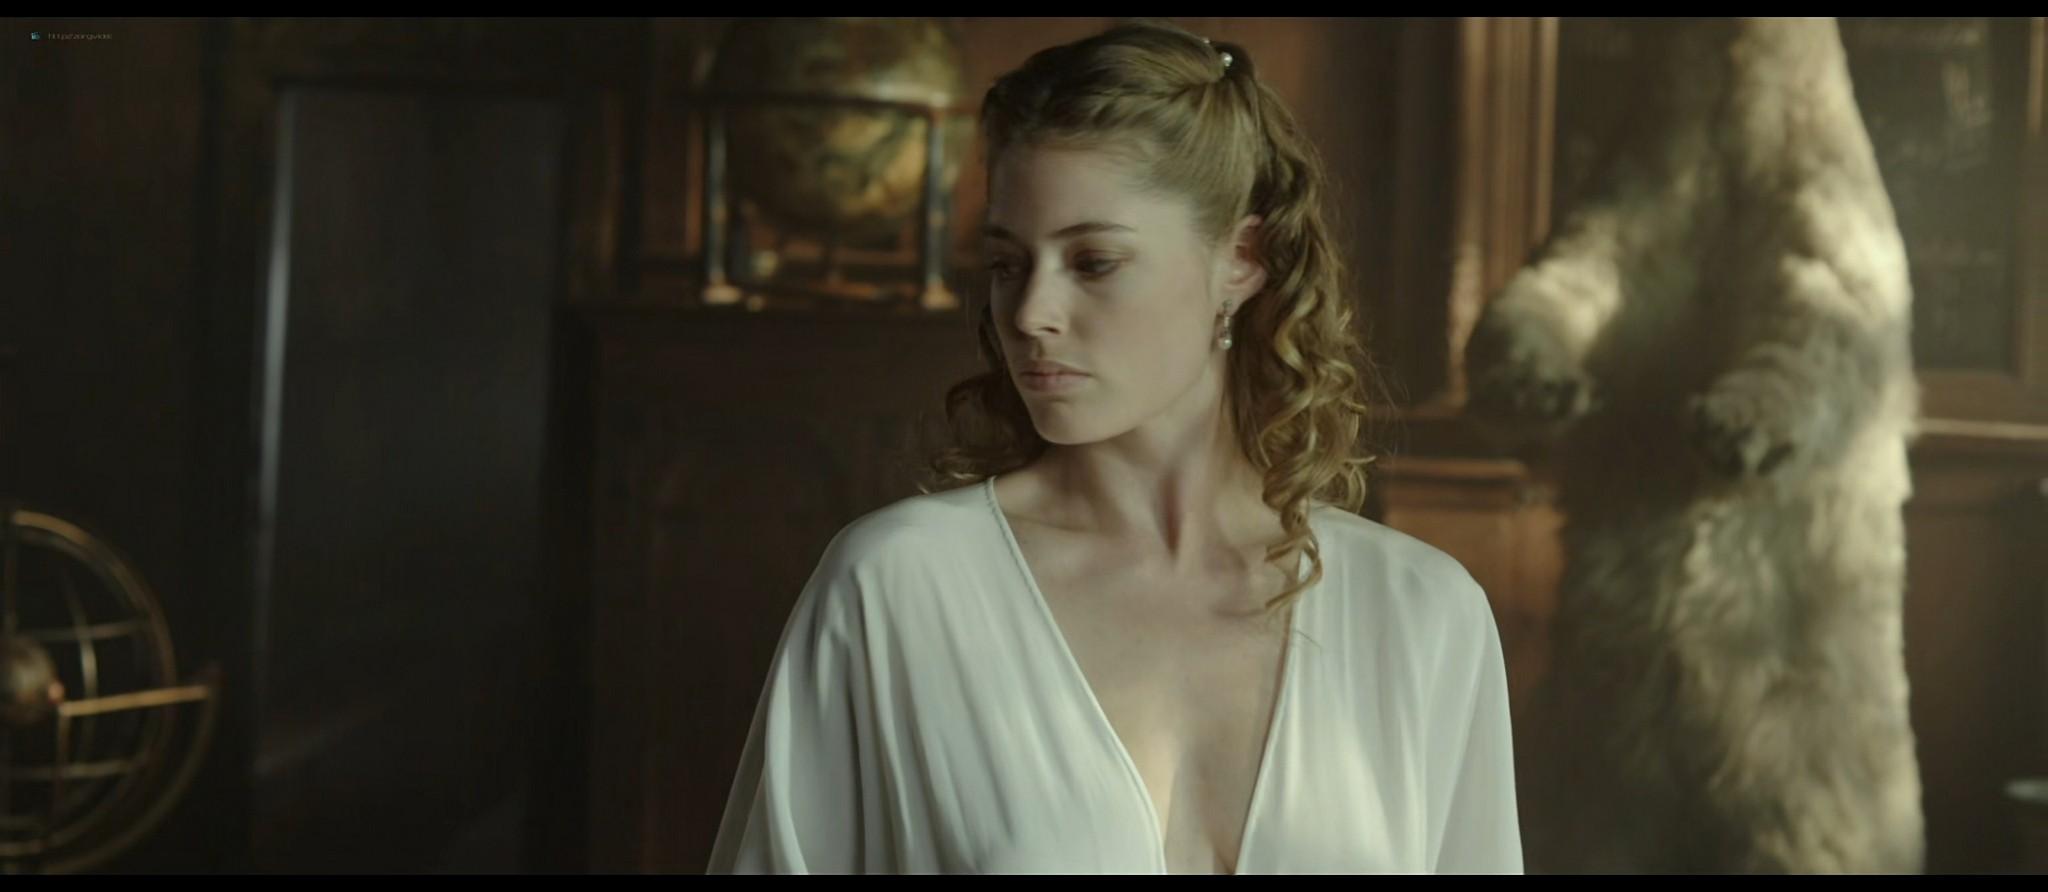 Doutzen Kroes cute and very sexy - Nova Zembla (2011) HD 1080p BluRay